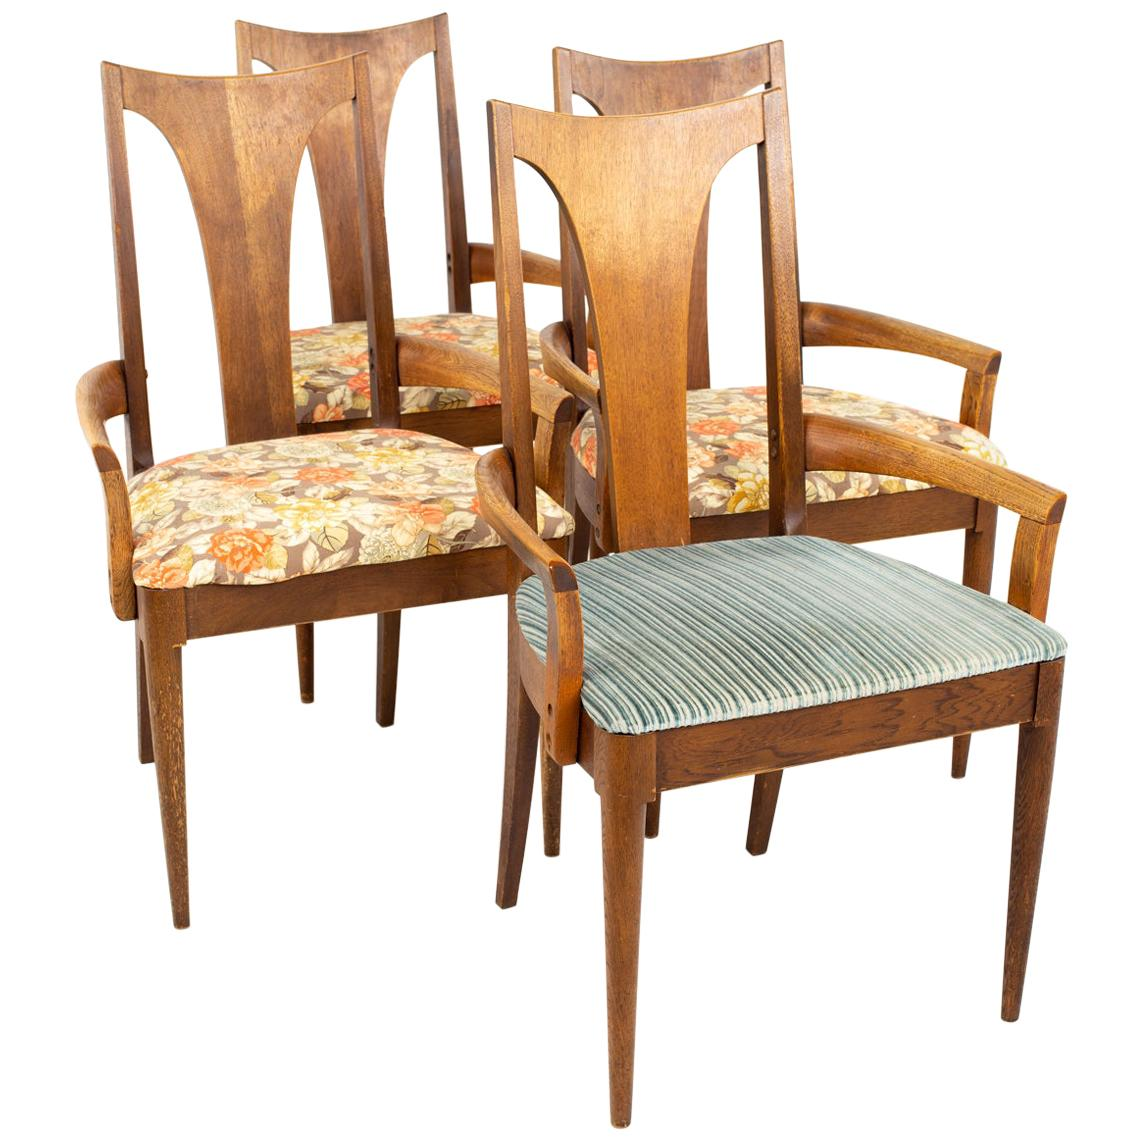 Broyhill Brasilia II Mid Century Walnut Captains Dining Chairs, Set of 4